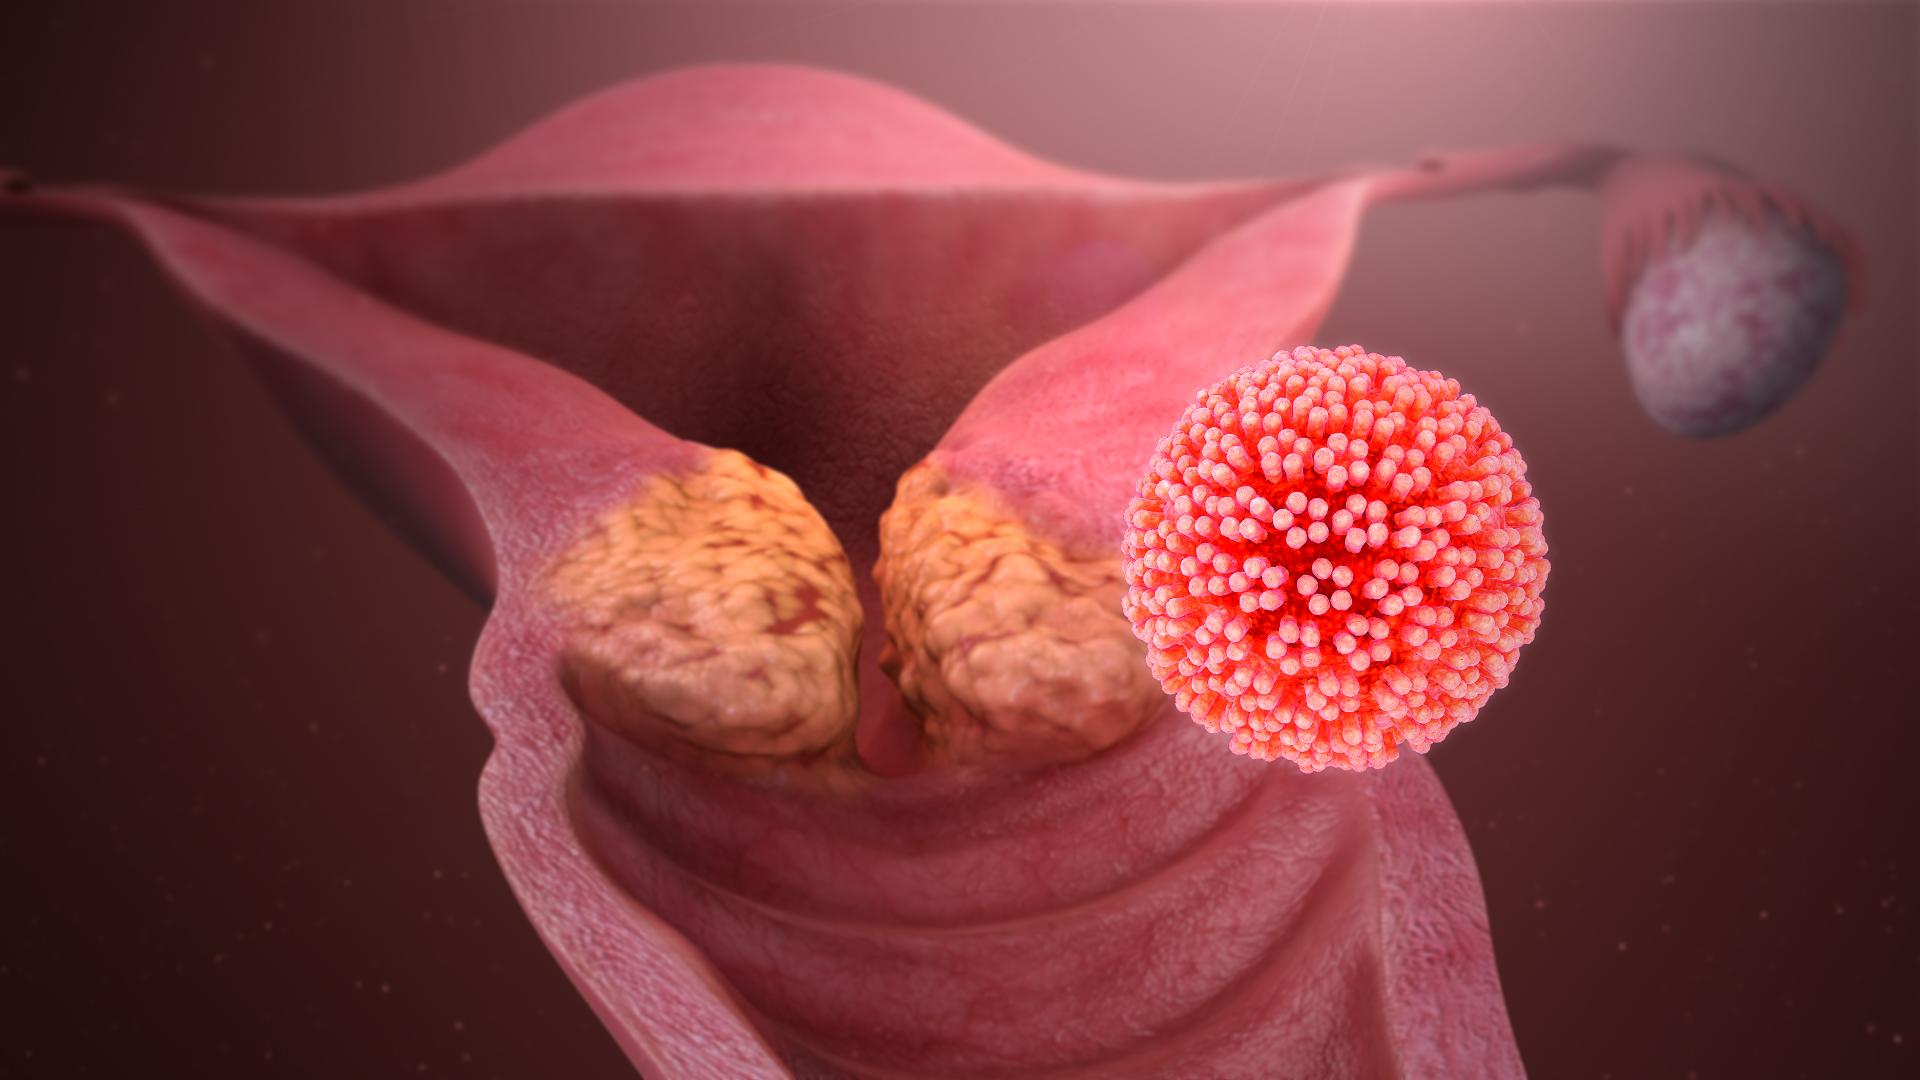 hpv man papilloma emberi papillomavírus a vérben